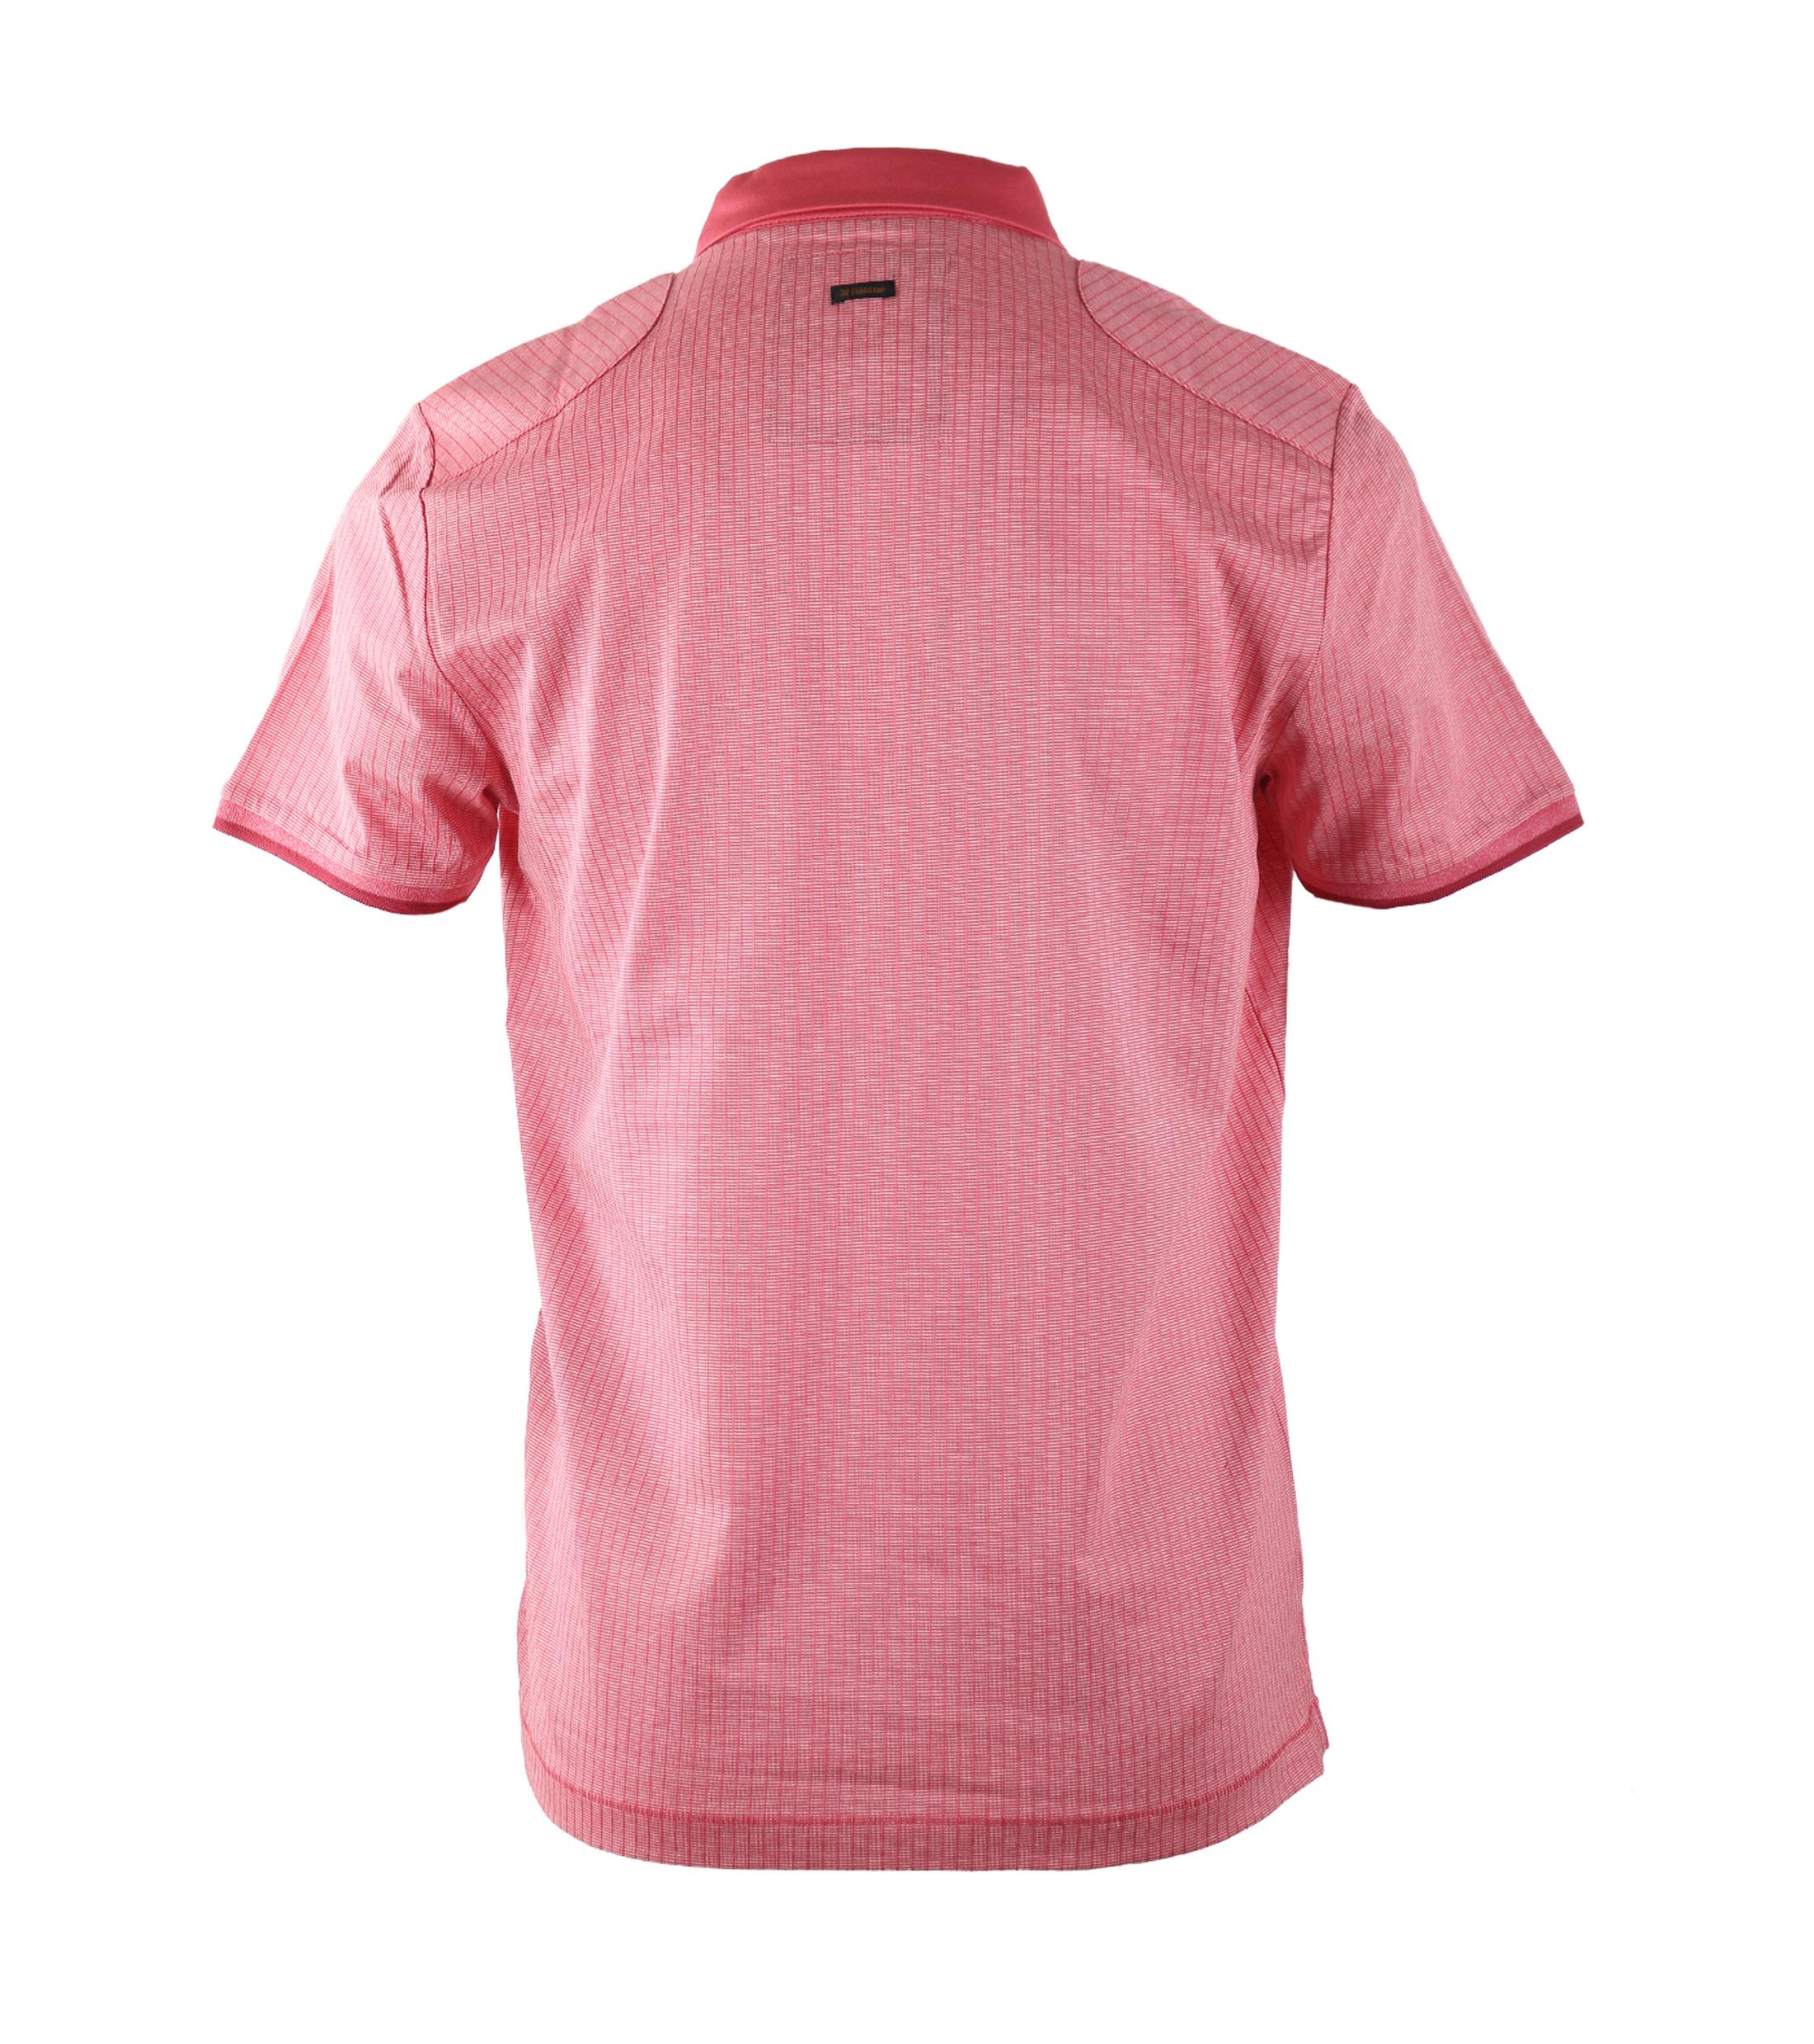 Vanguard Poloshirt Rood Jacquard foto 1